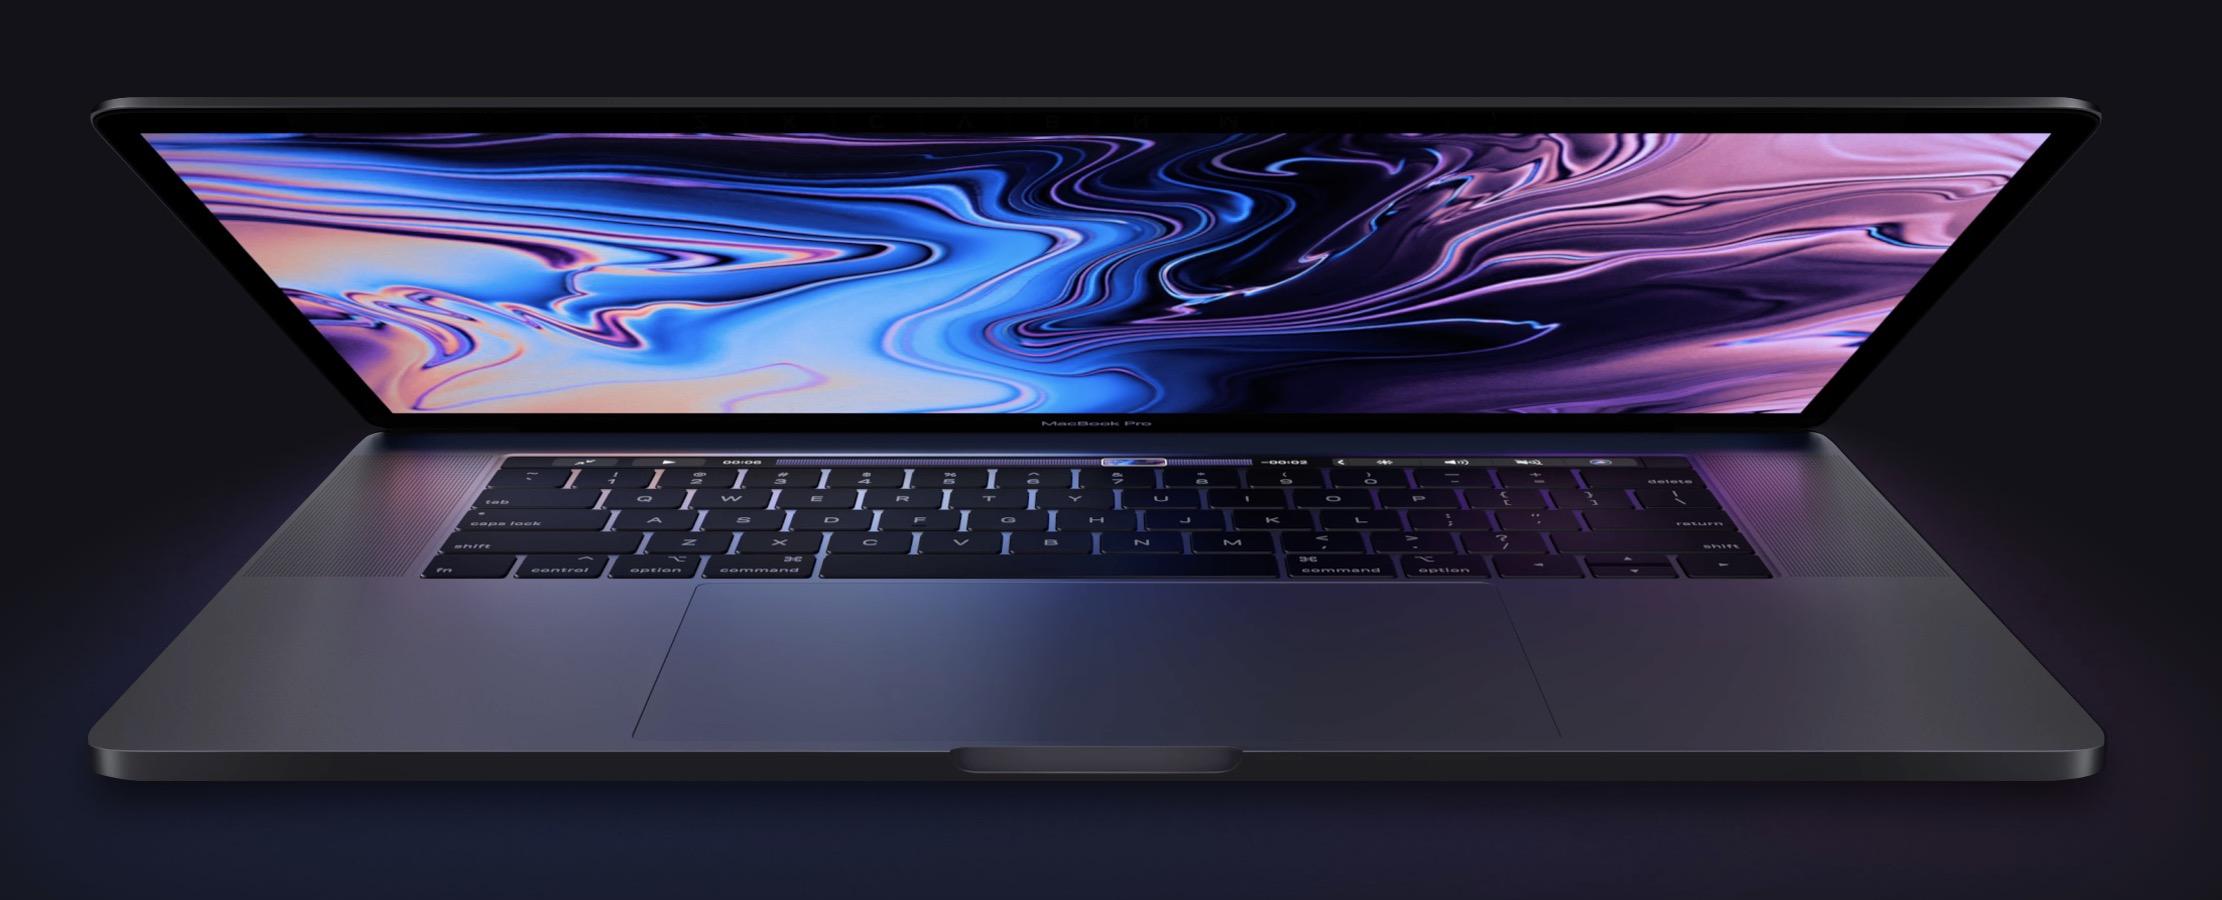 Macbook Pro i9